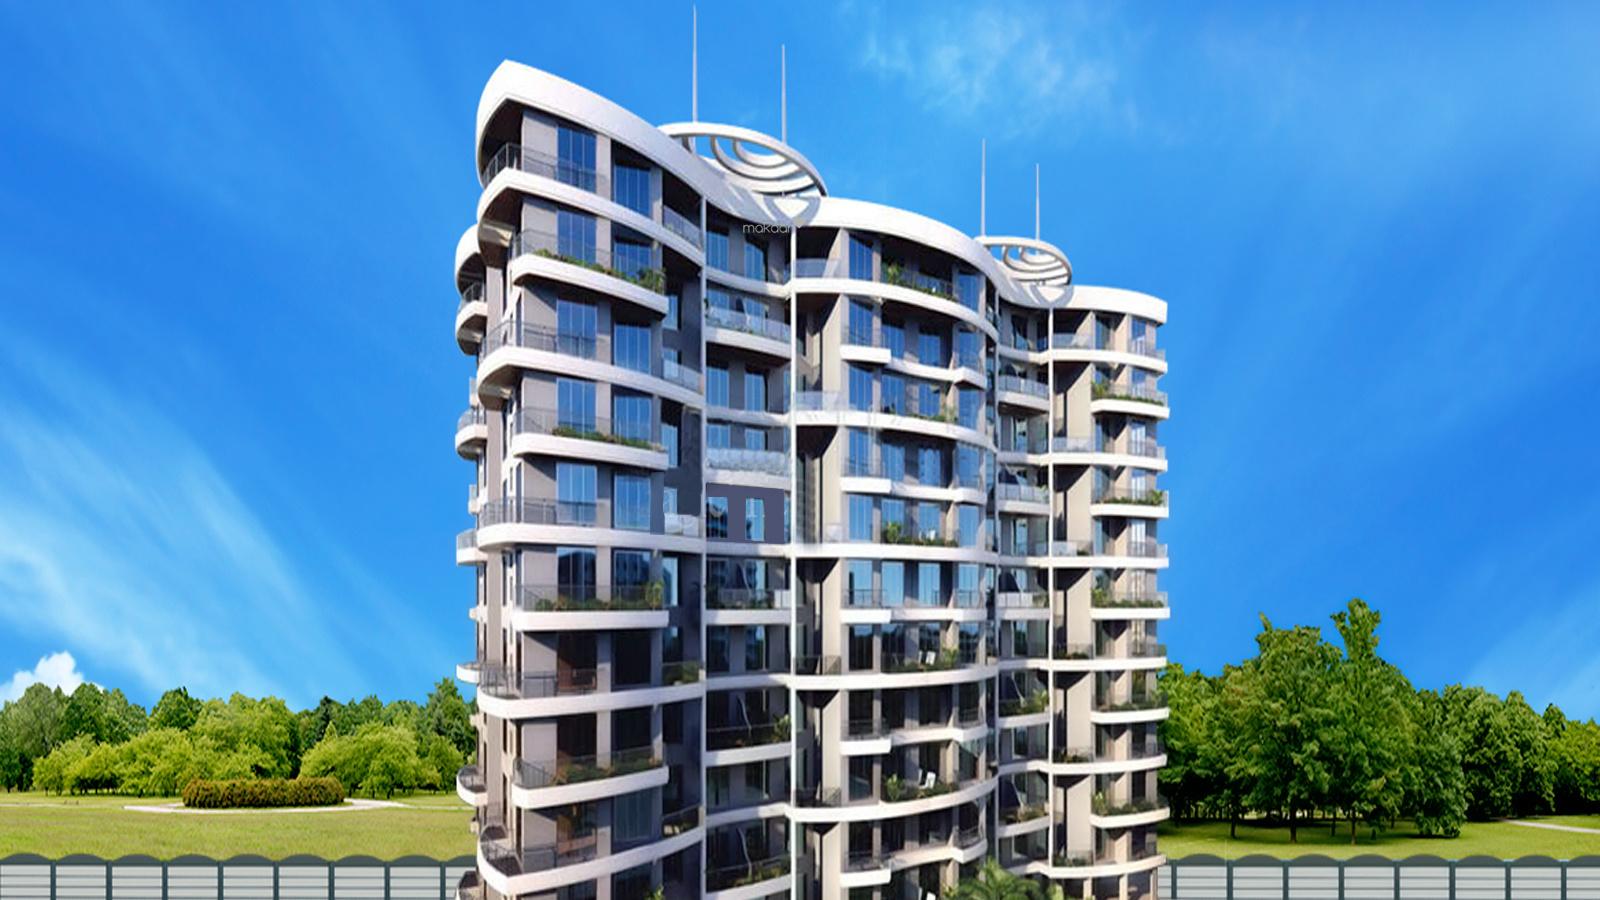 1560 sq ft 3BHK 3BHK+3T (1,560 sq ft) Property By Raviraj Real Estate In Estado, Baner